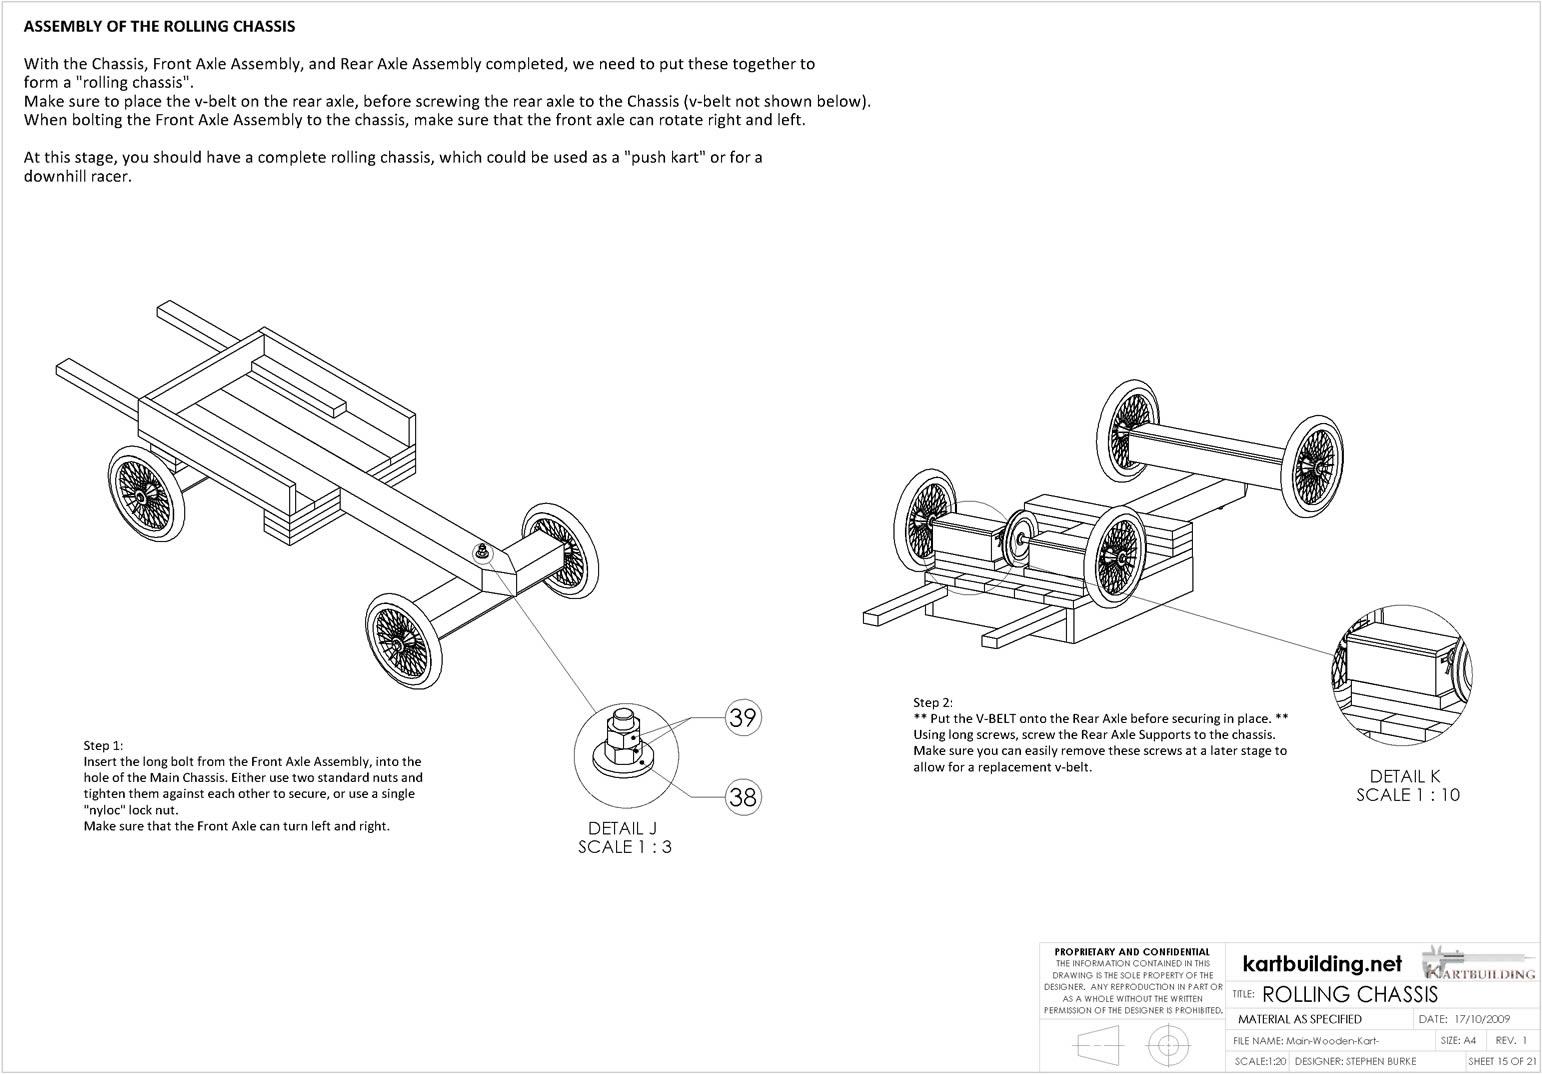 Lawn mower engine go-kart frames drawings for kids.